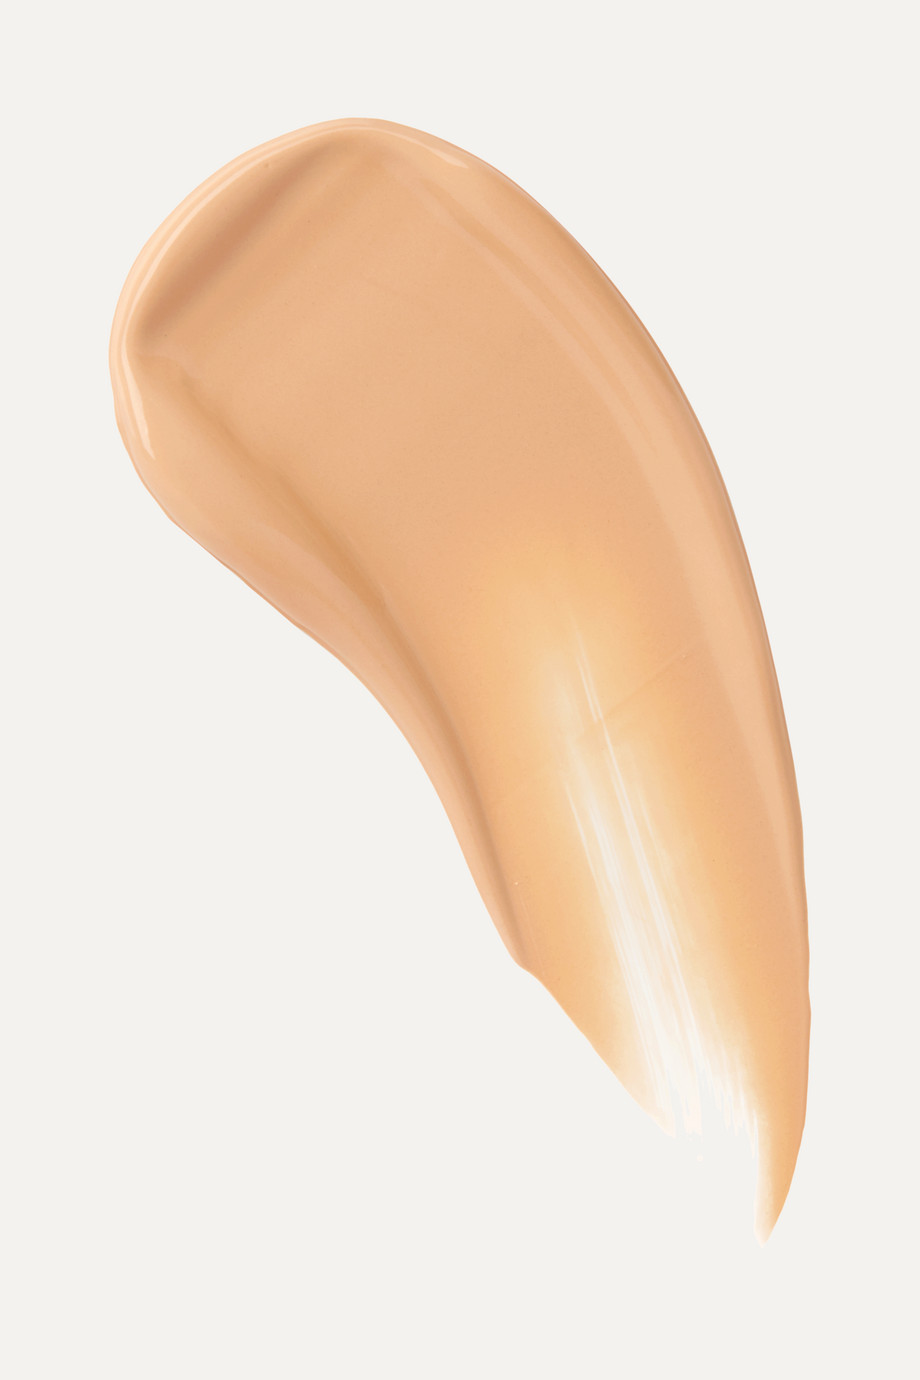 Charlotte Tilbury Magic Foundation Flawless Long-Lasting Coverage SPF15 - Shade 4, 30ml